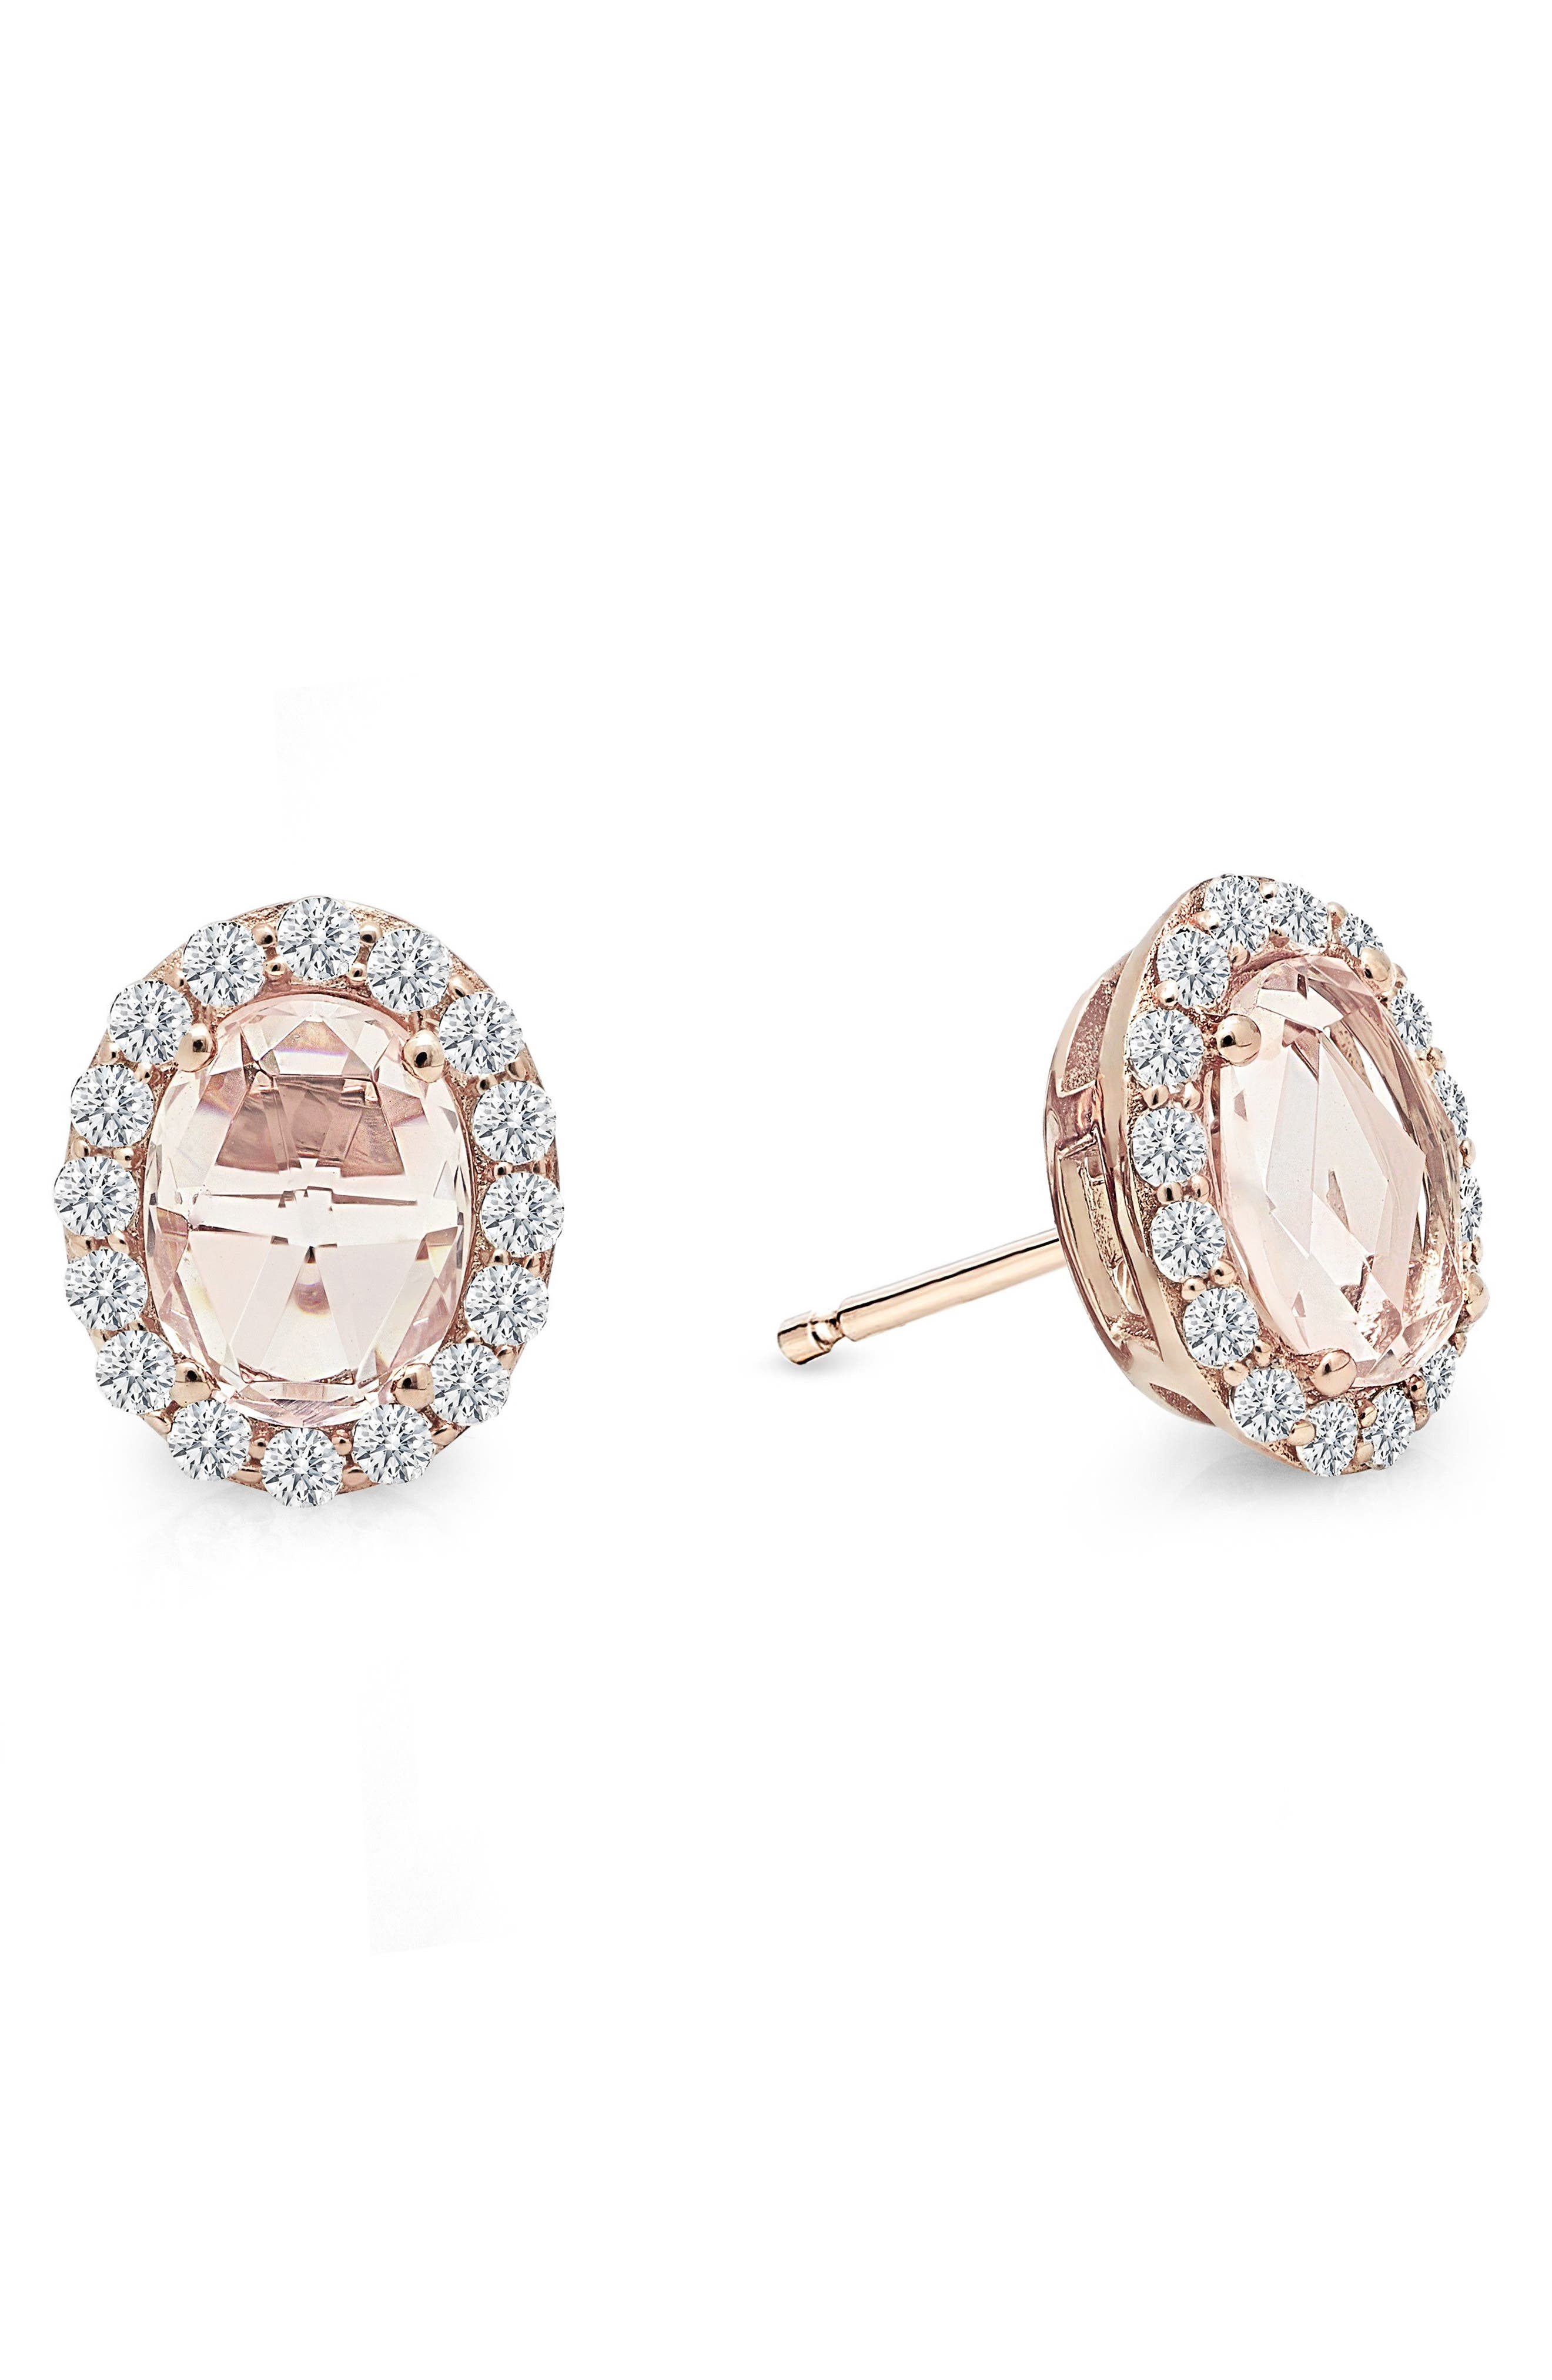 Simulated Diamond Halo Earrings,                             Main thumbnail 1, color,                             Pink / Rose Gold